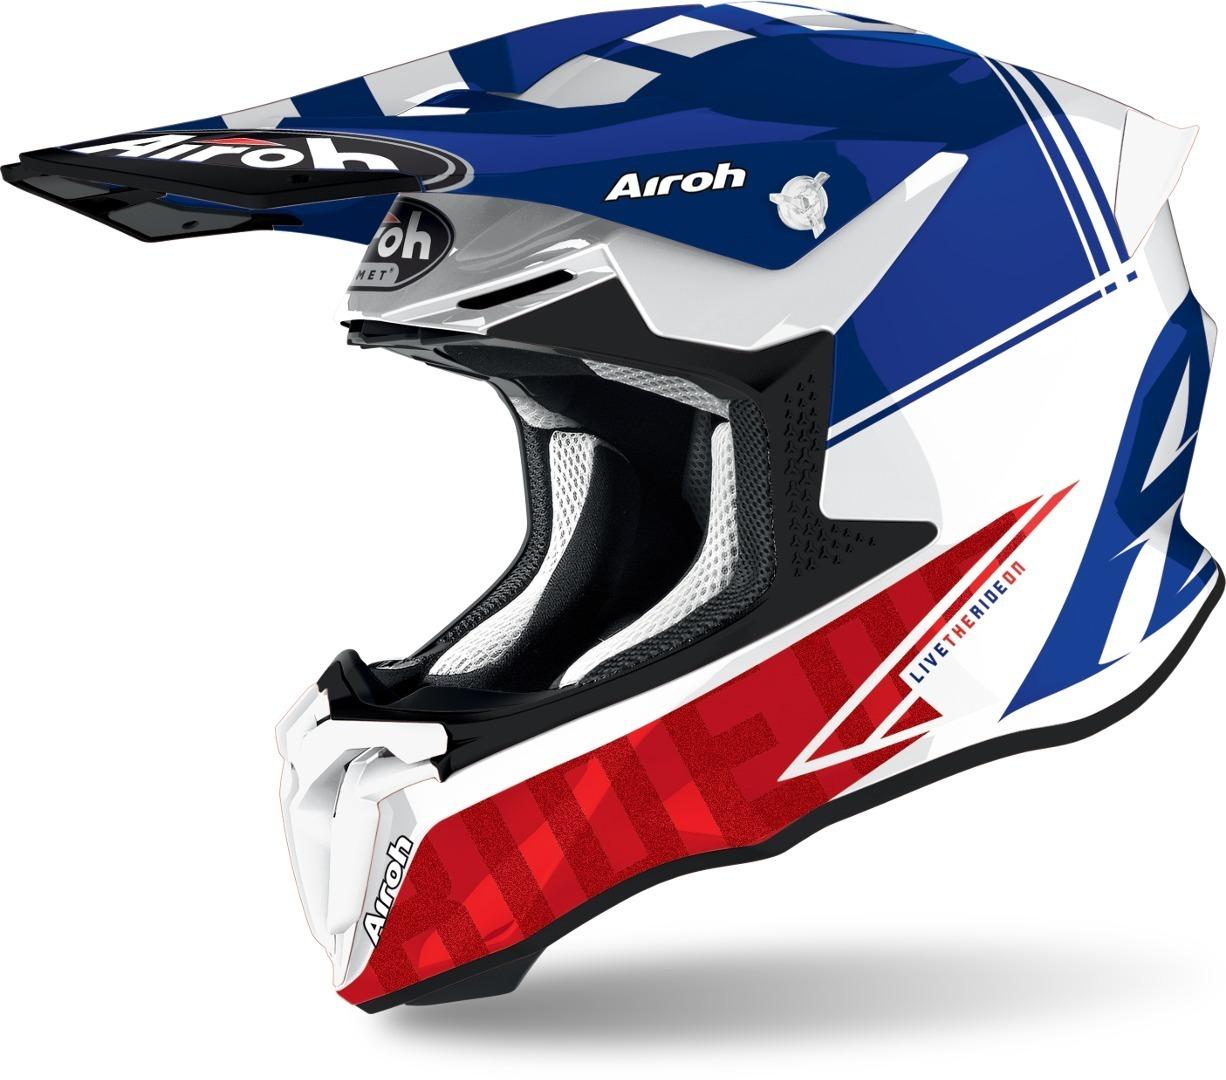 Airoh Twist 2.0 Tech Motocross Helm, blau, Größe XL, blau, Größe XL